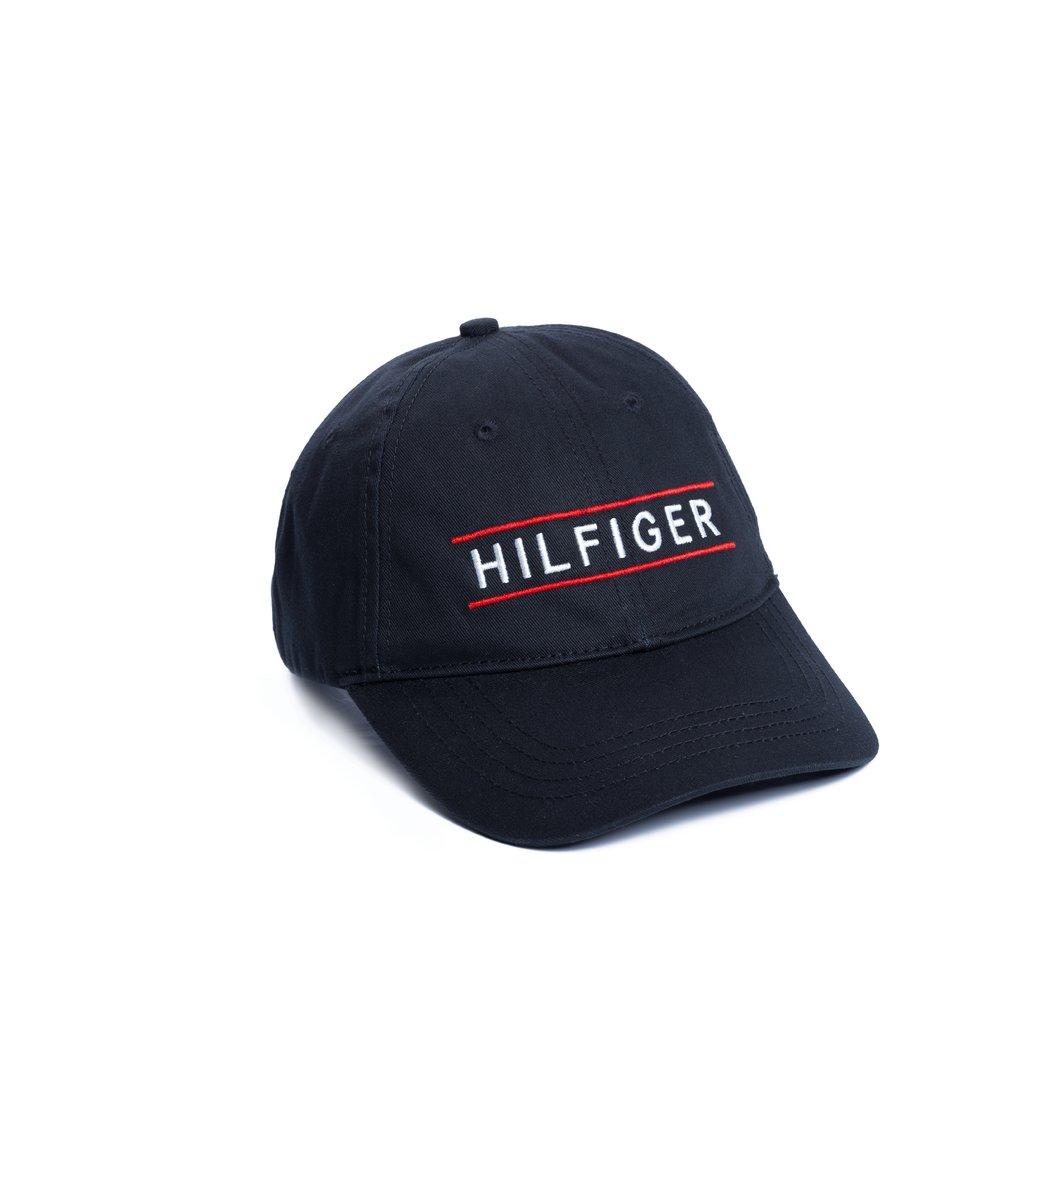 Кепка Tommy Hilfiger H1 Чёрный